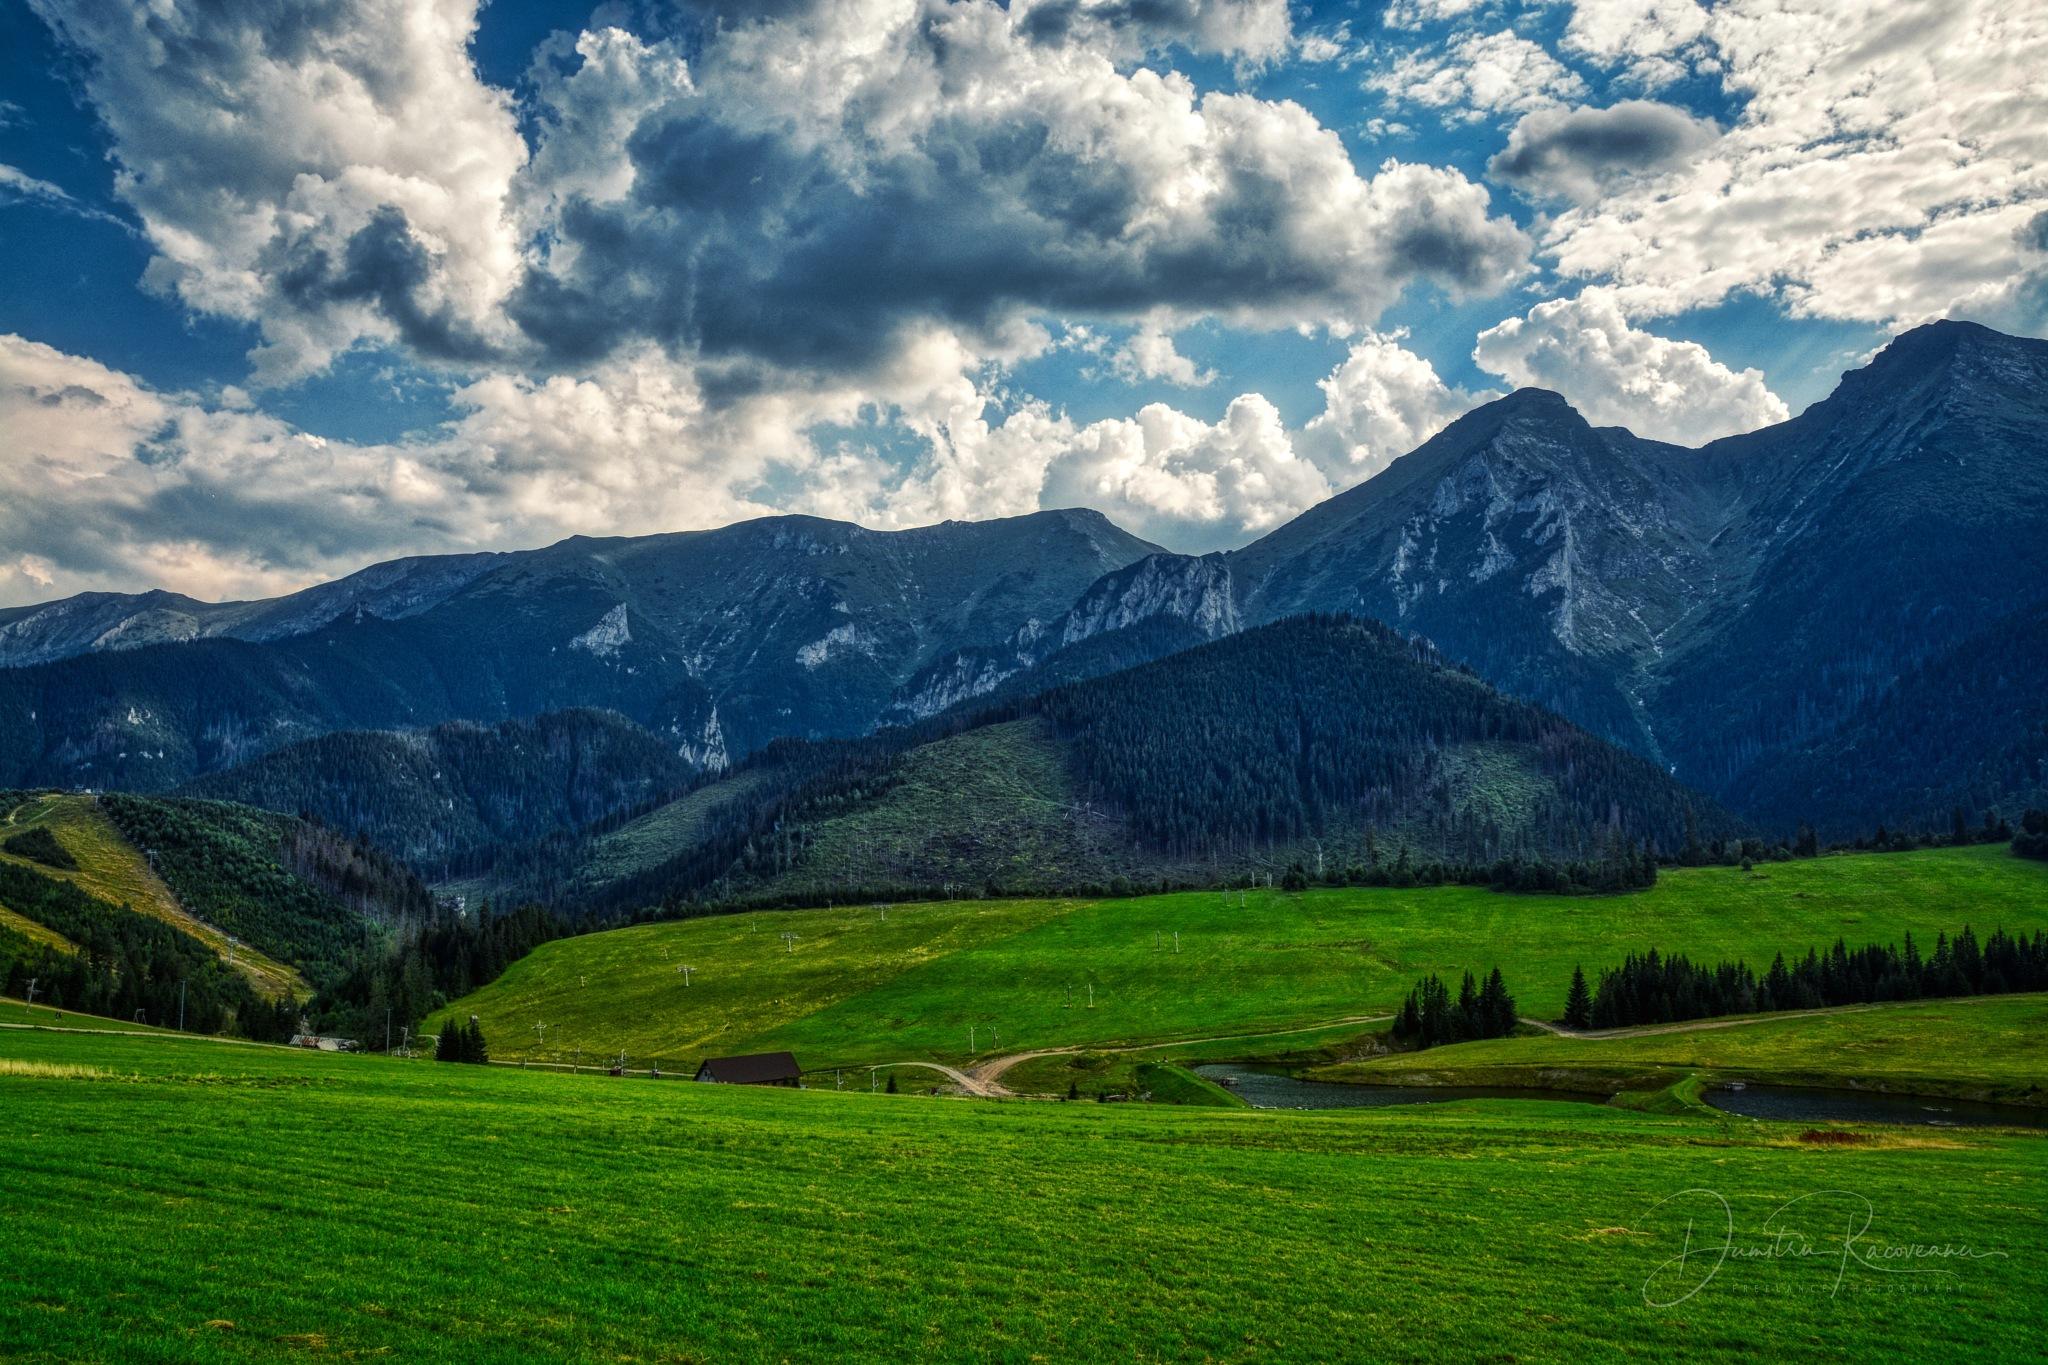 Muntii Tatra_2 by Dumitru Racoveanu